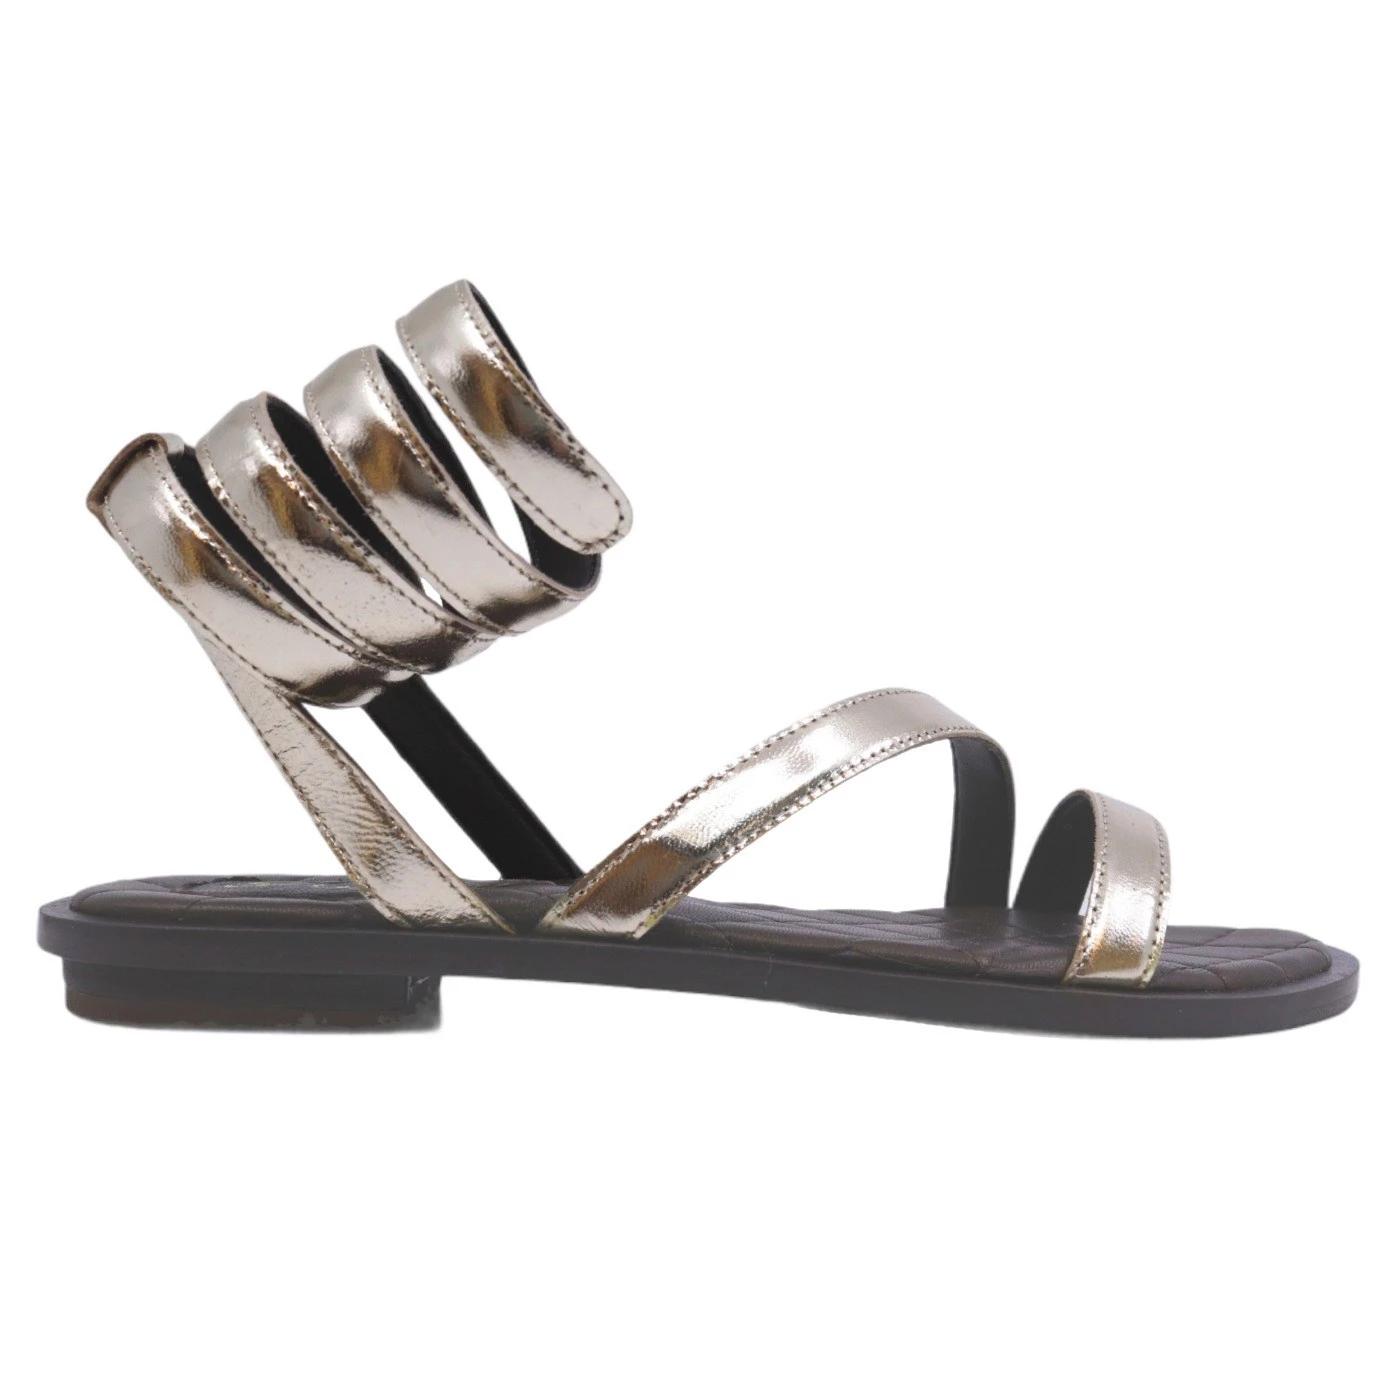 Hadel 1SA526 Kois sandalo da donna in pelle marrone oro